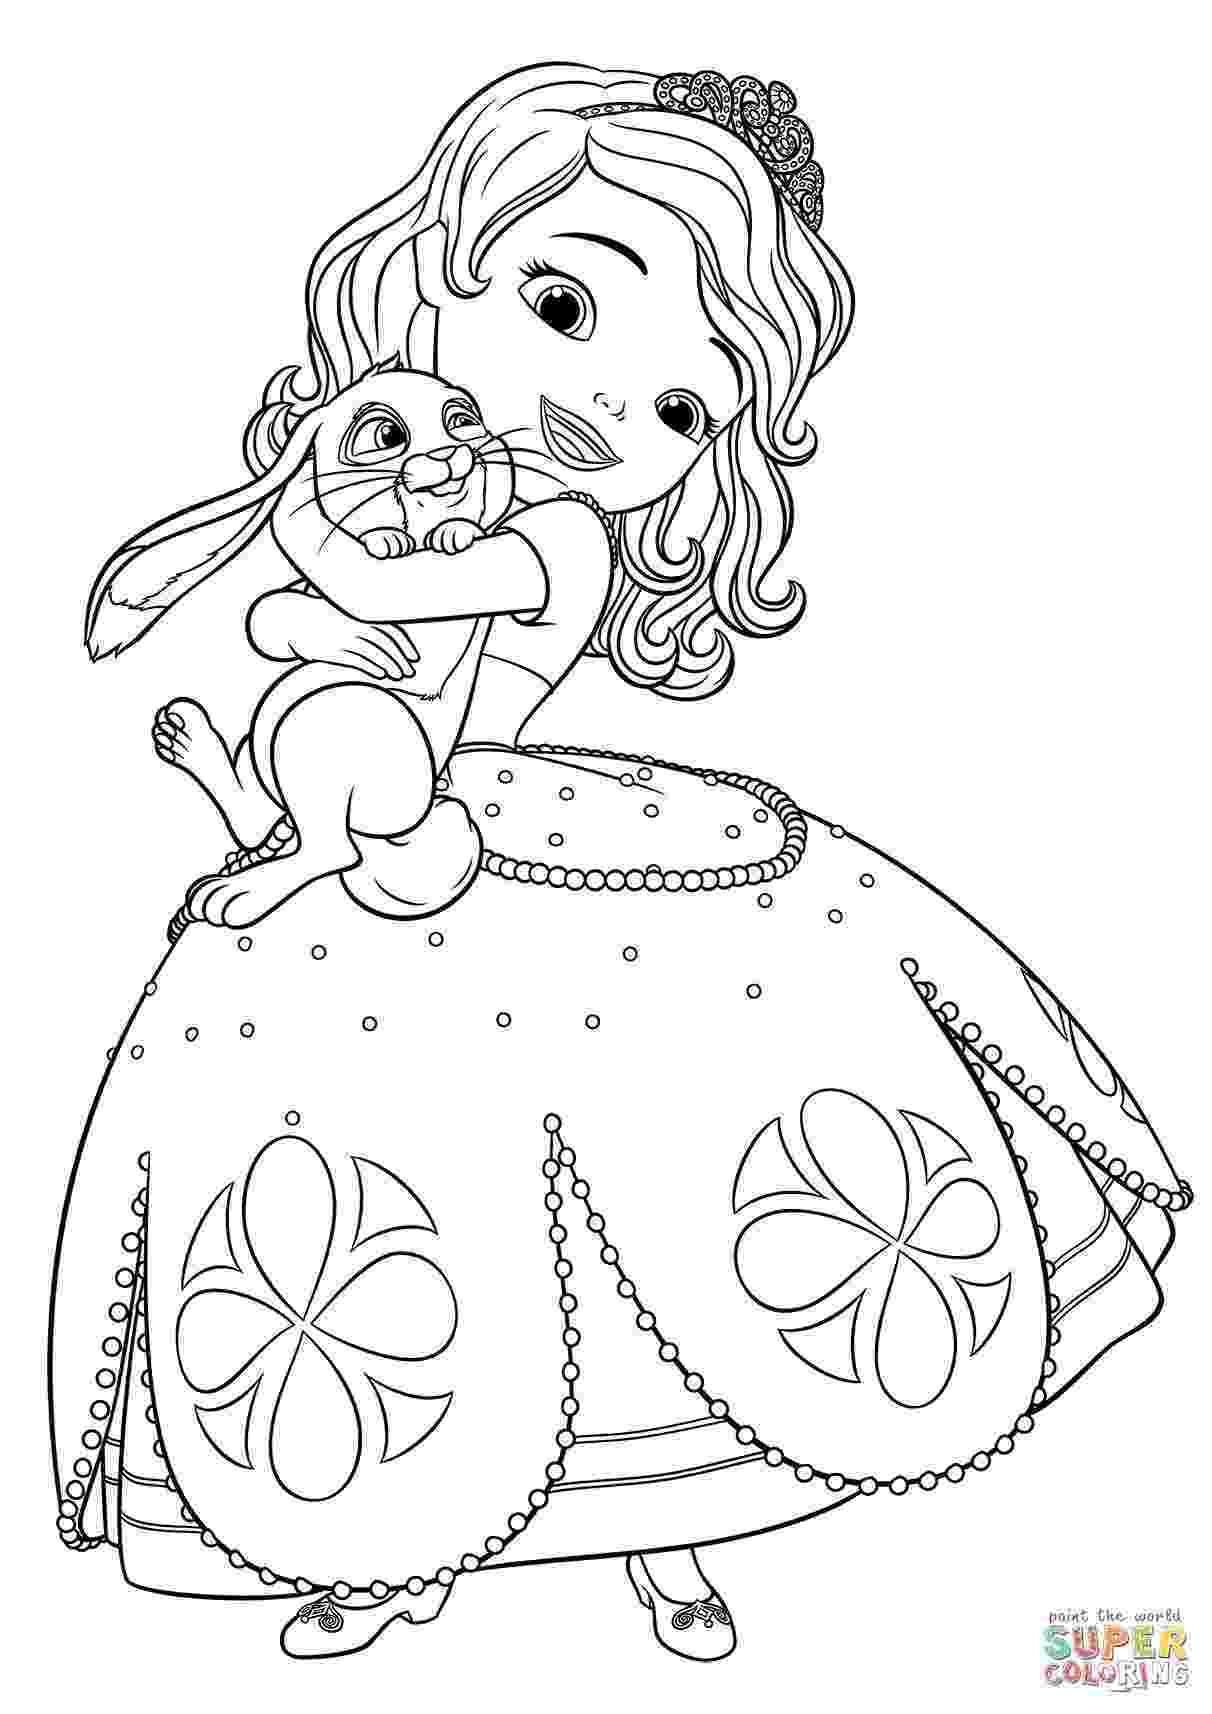 princess sofia printable coloring pages sofia the first coloring pages getcoloringpagescom pages coloring princess sofia printable